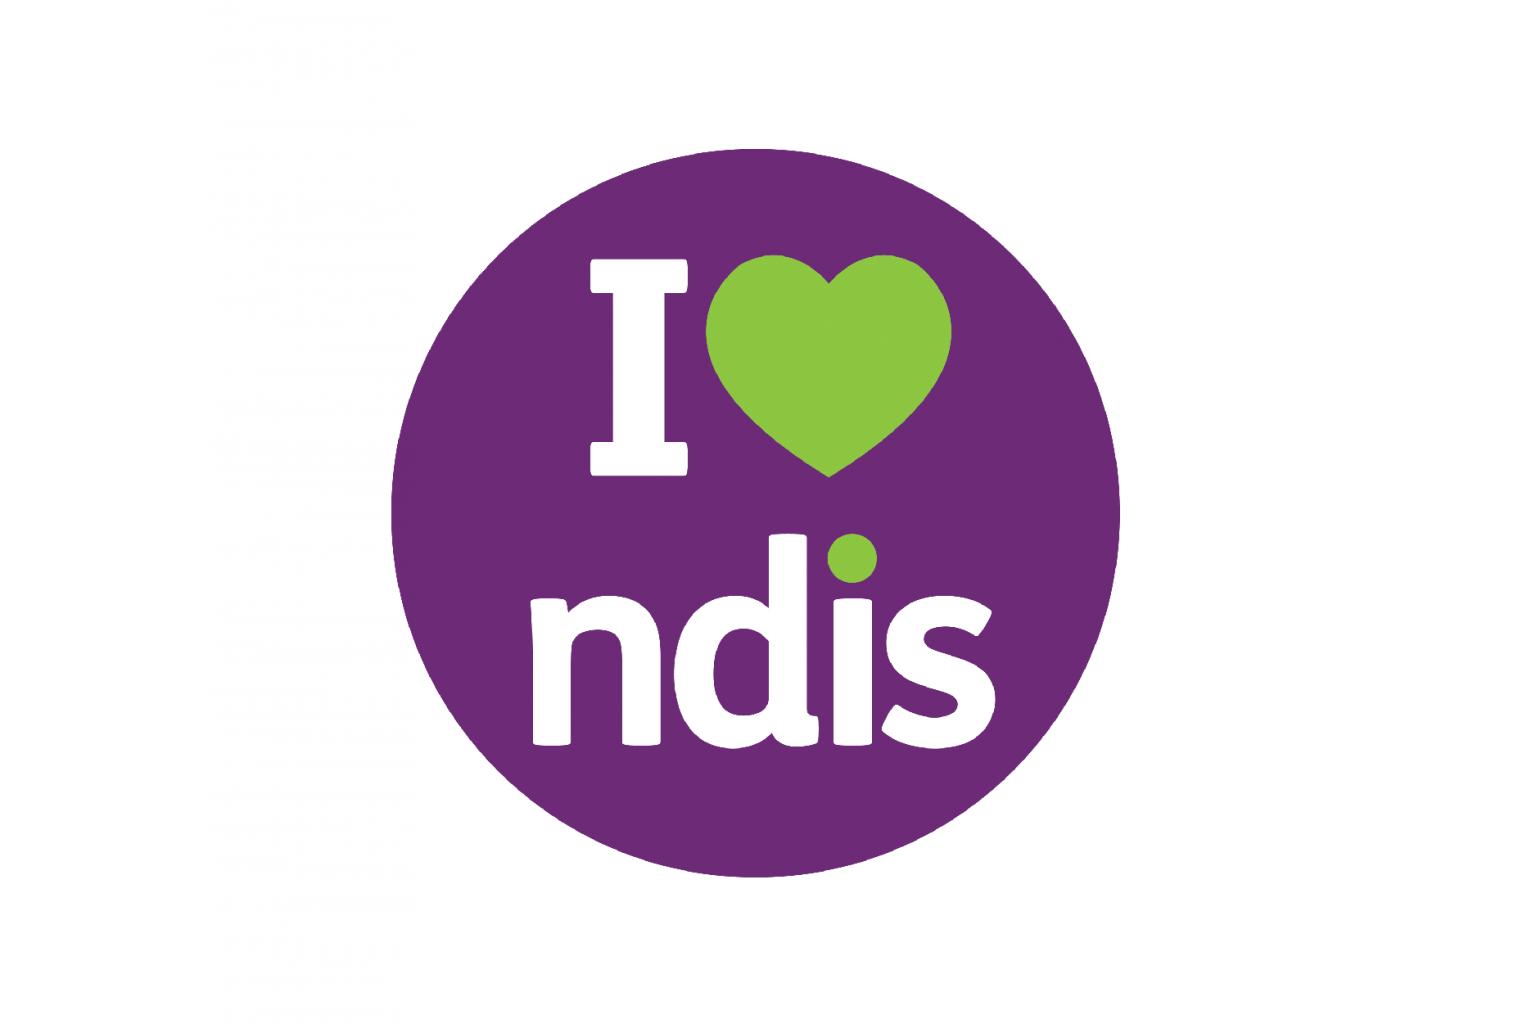 ndis-01-1536x1024